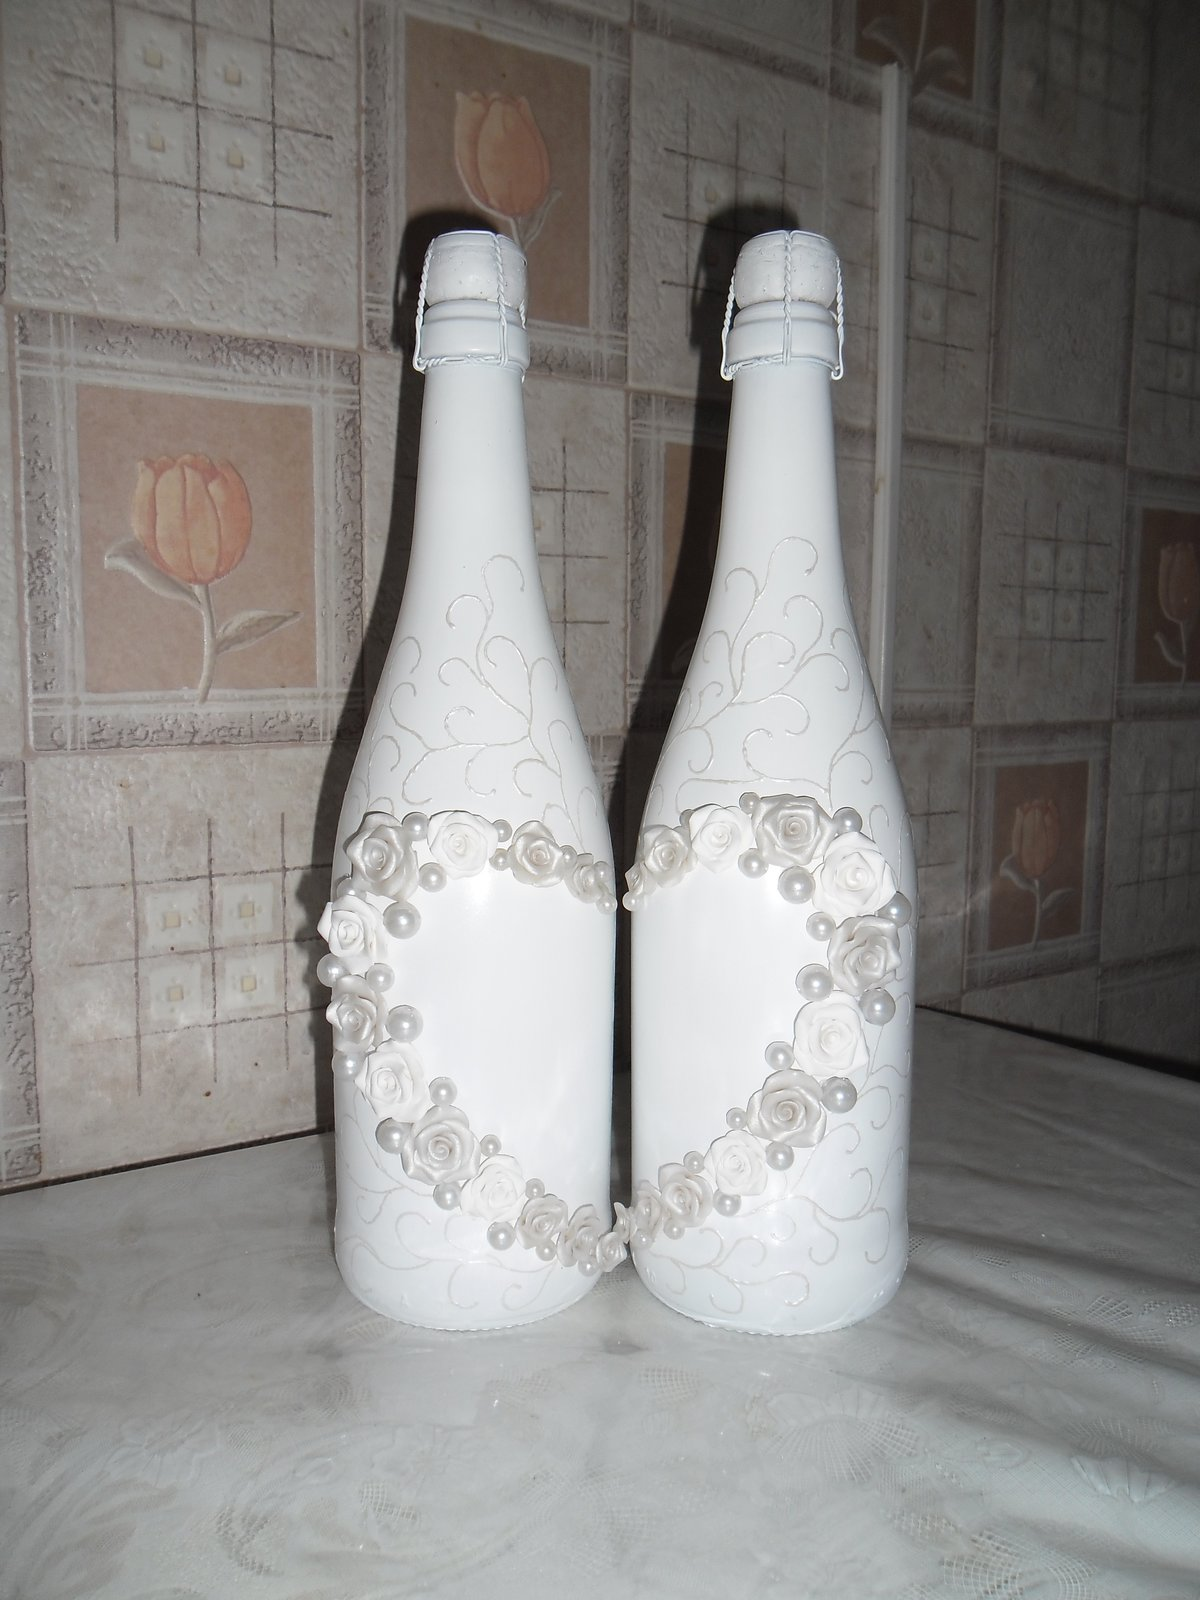 Свадебная бутылка с маками